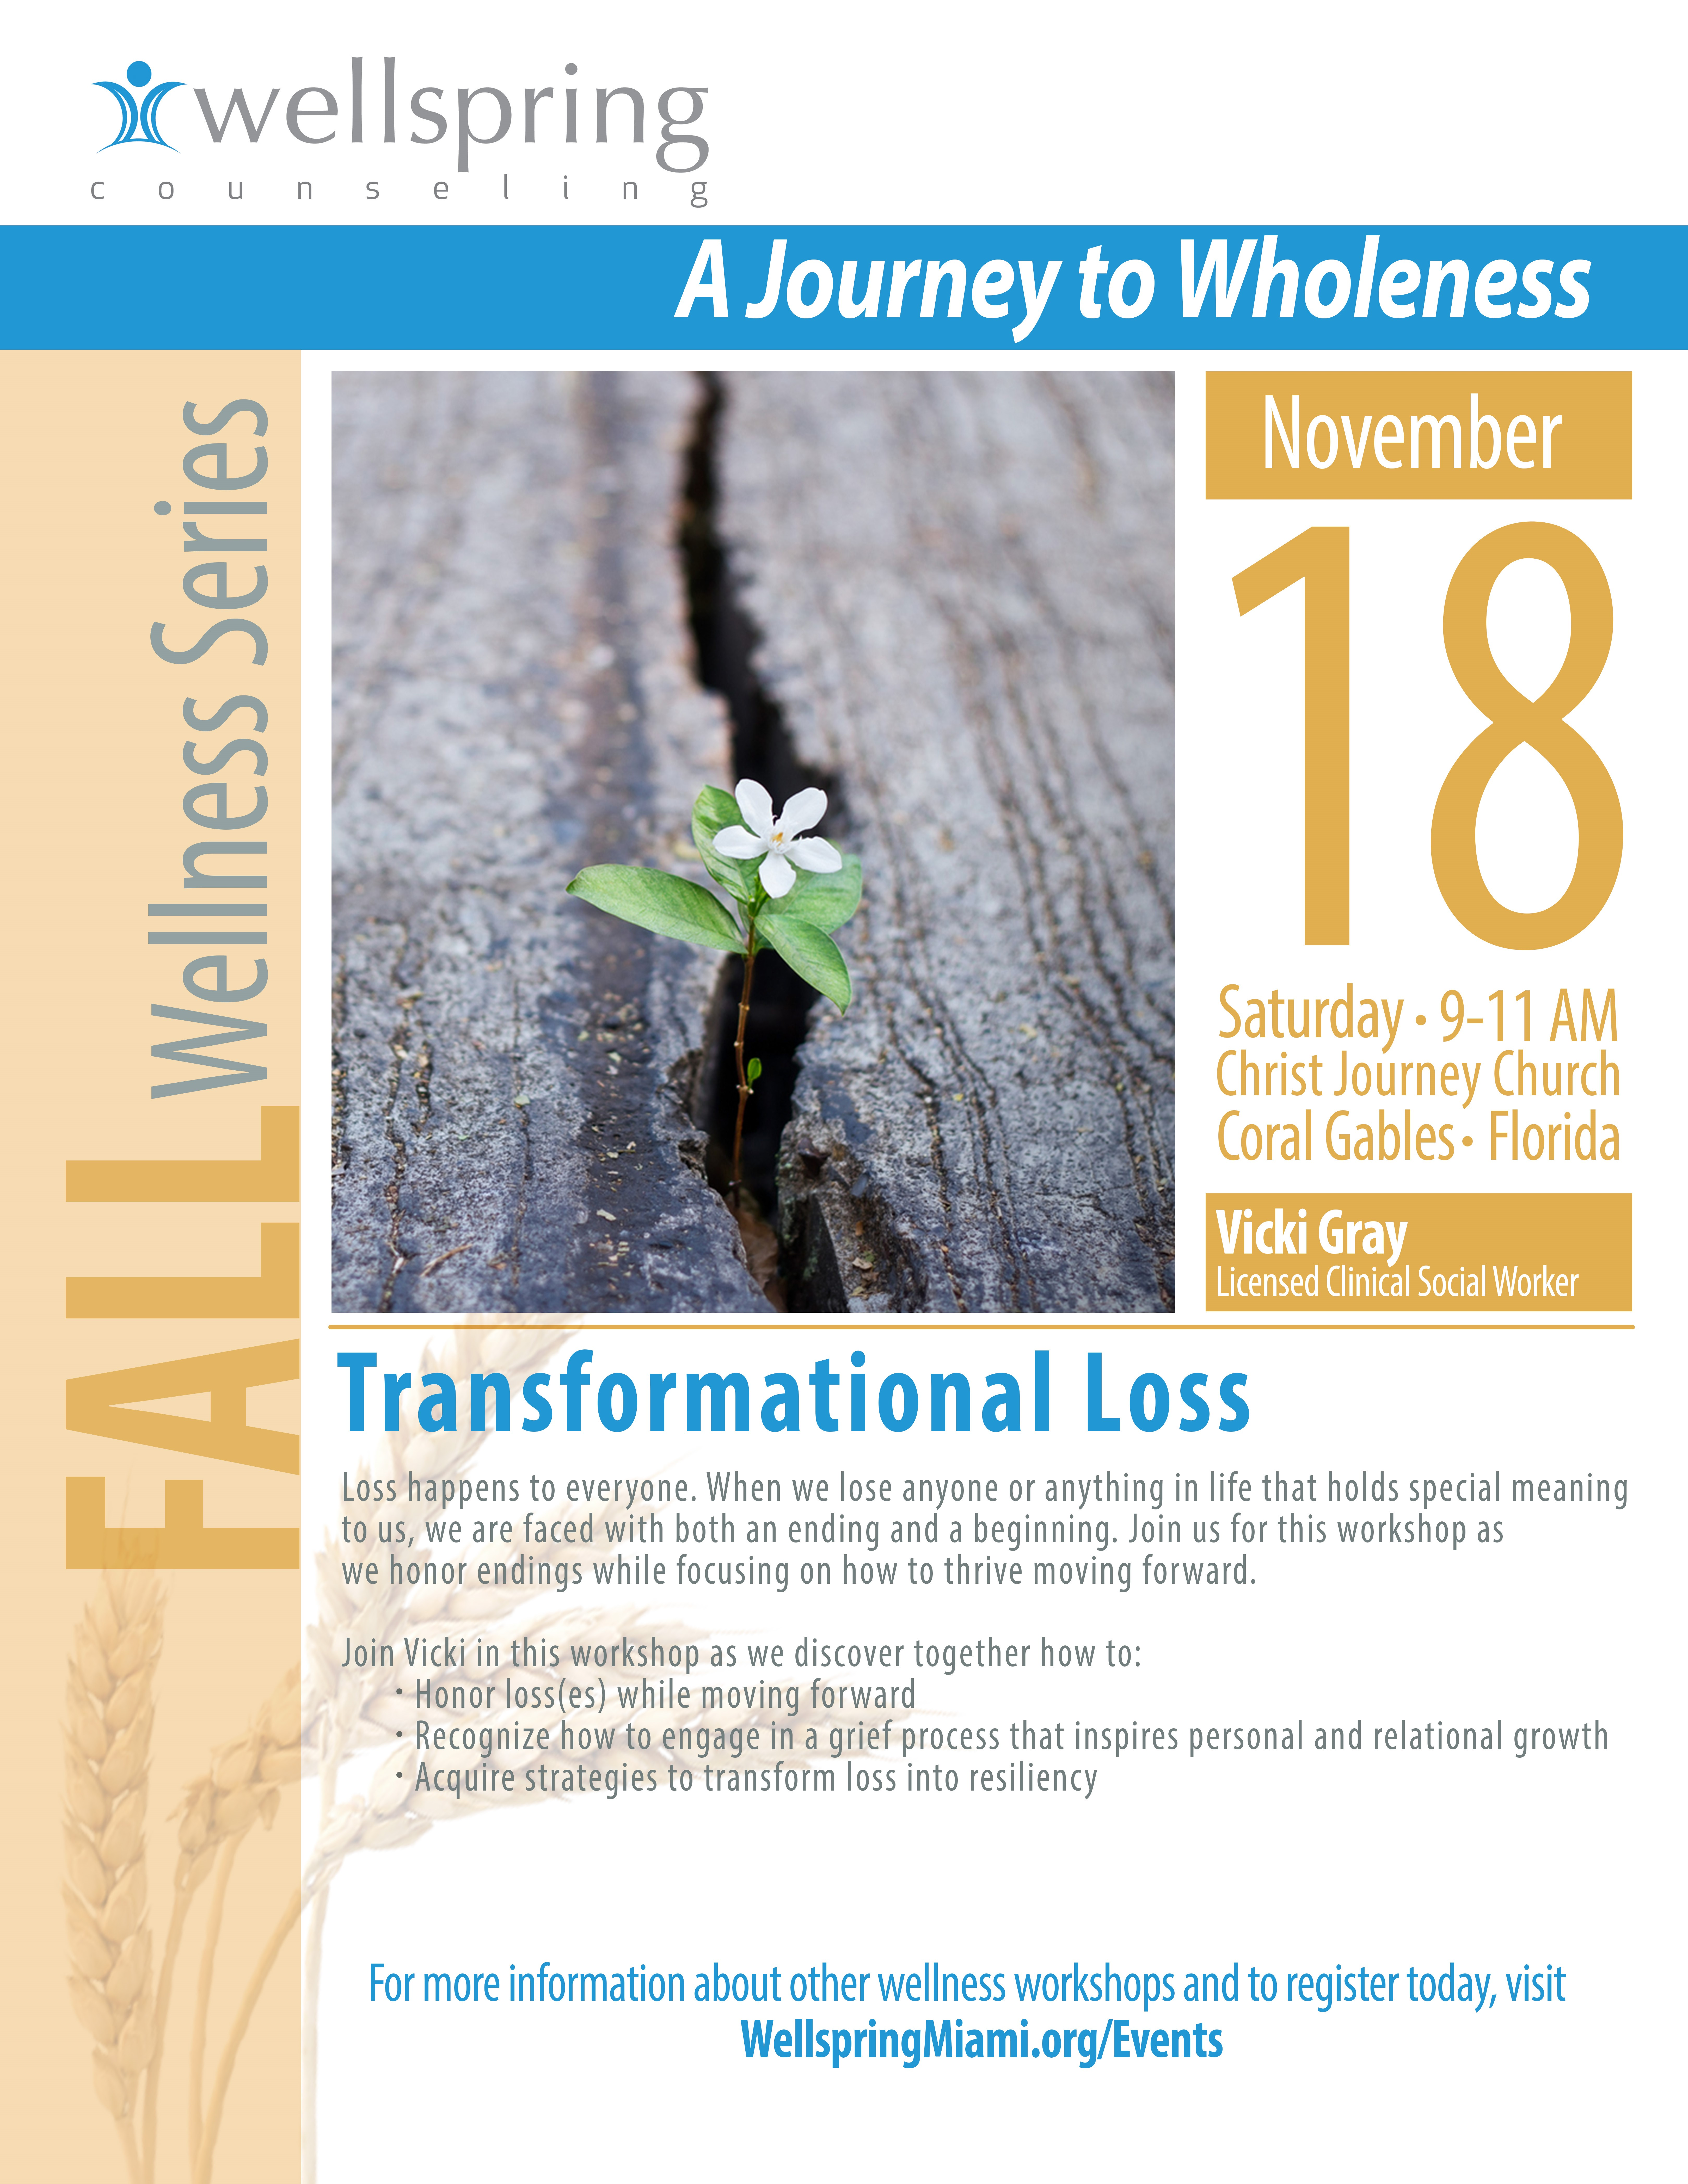 transformational loss flyer_updated.jpg